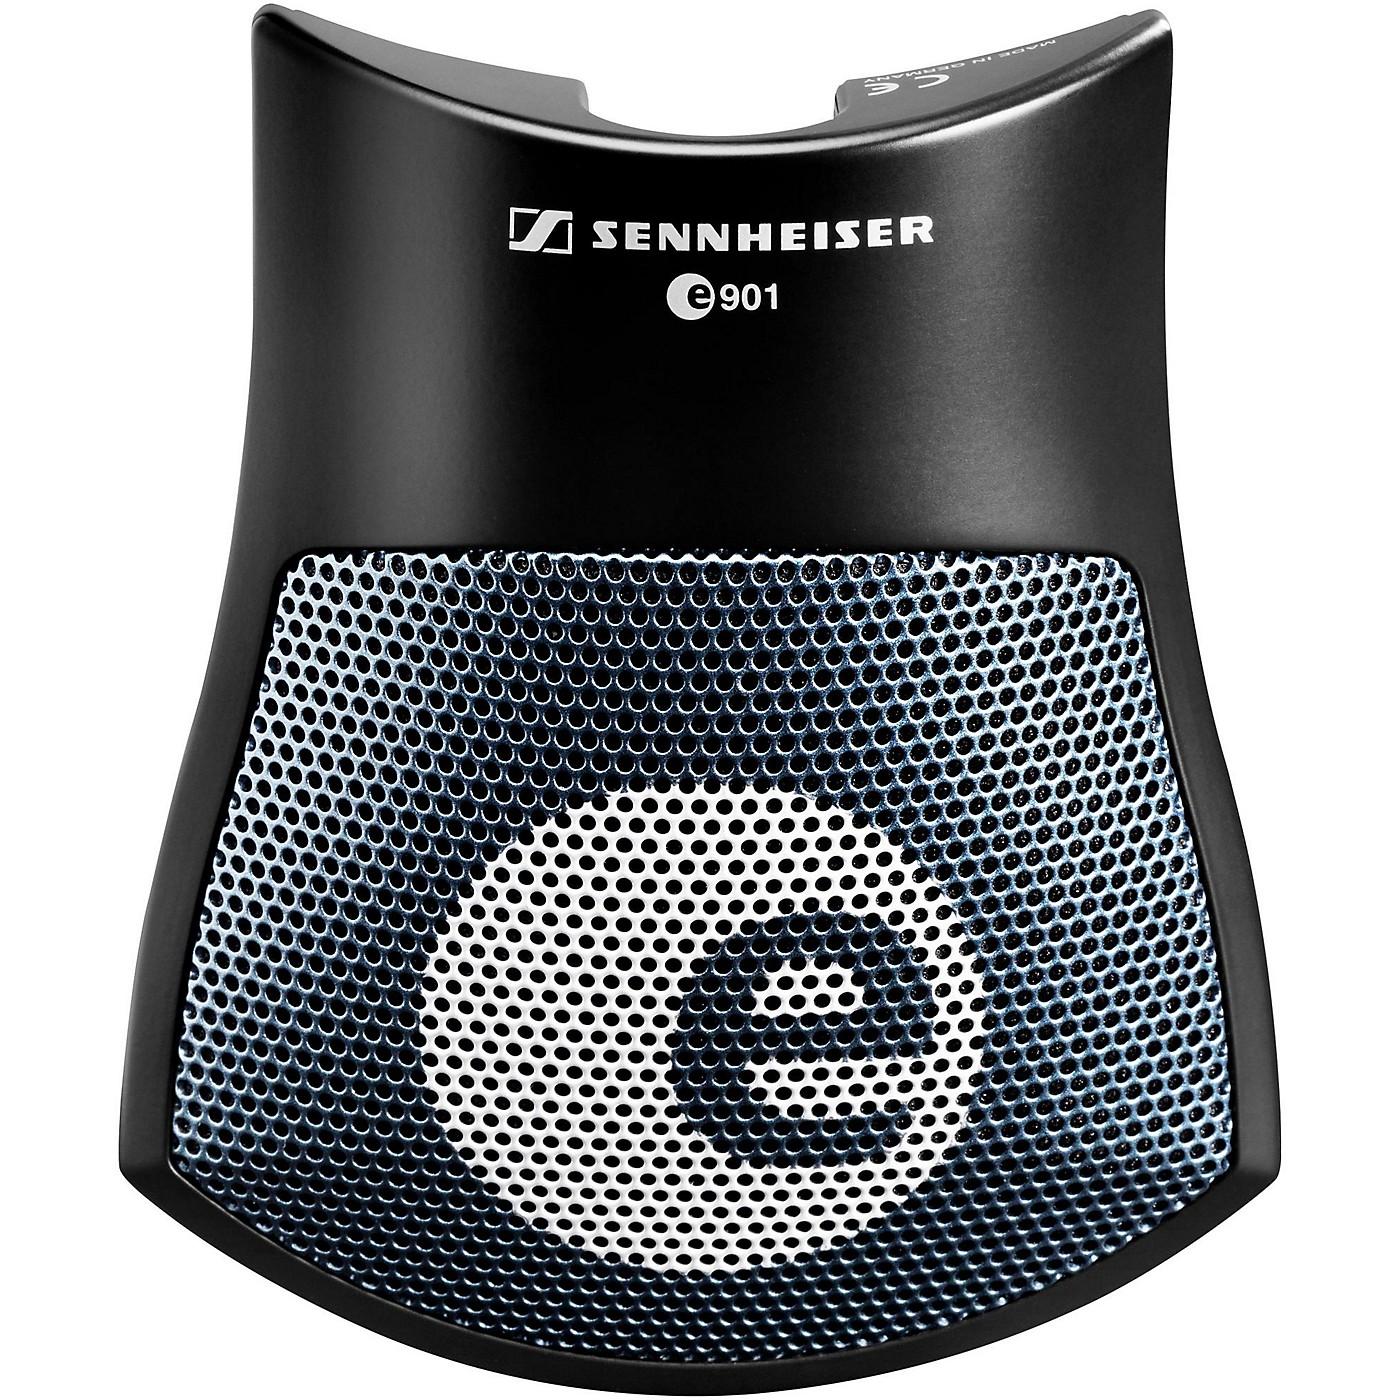 Sennheiser evolution e901 Cardioid/Boundary Instrument Microphone thumbnail